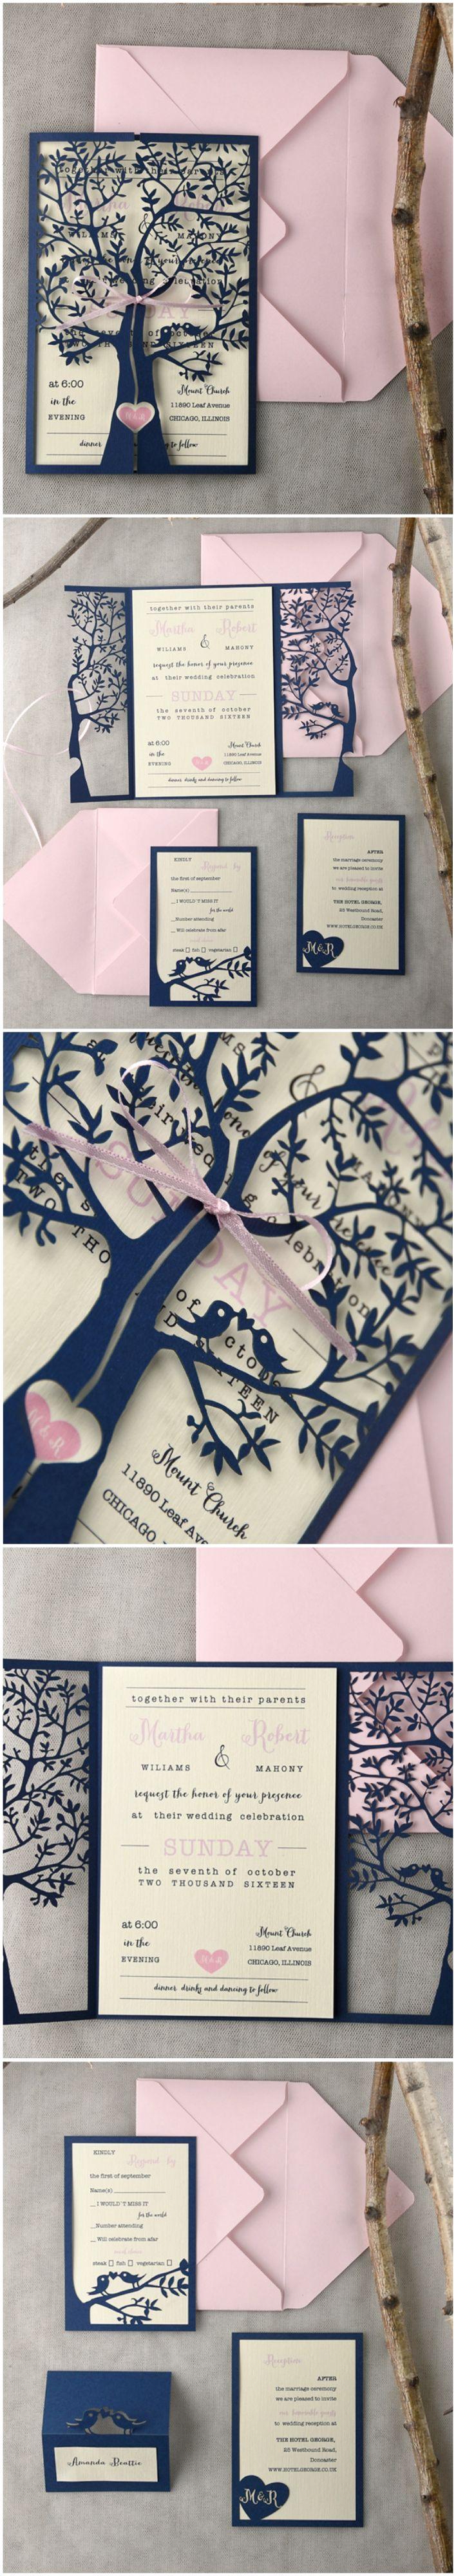 Pink & Navy Lasercut Wedding Invitations - Tree & Lovebirds #pink #navy #weddinginvitations #elegant #romantic #unique #lasercut